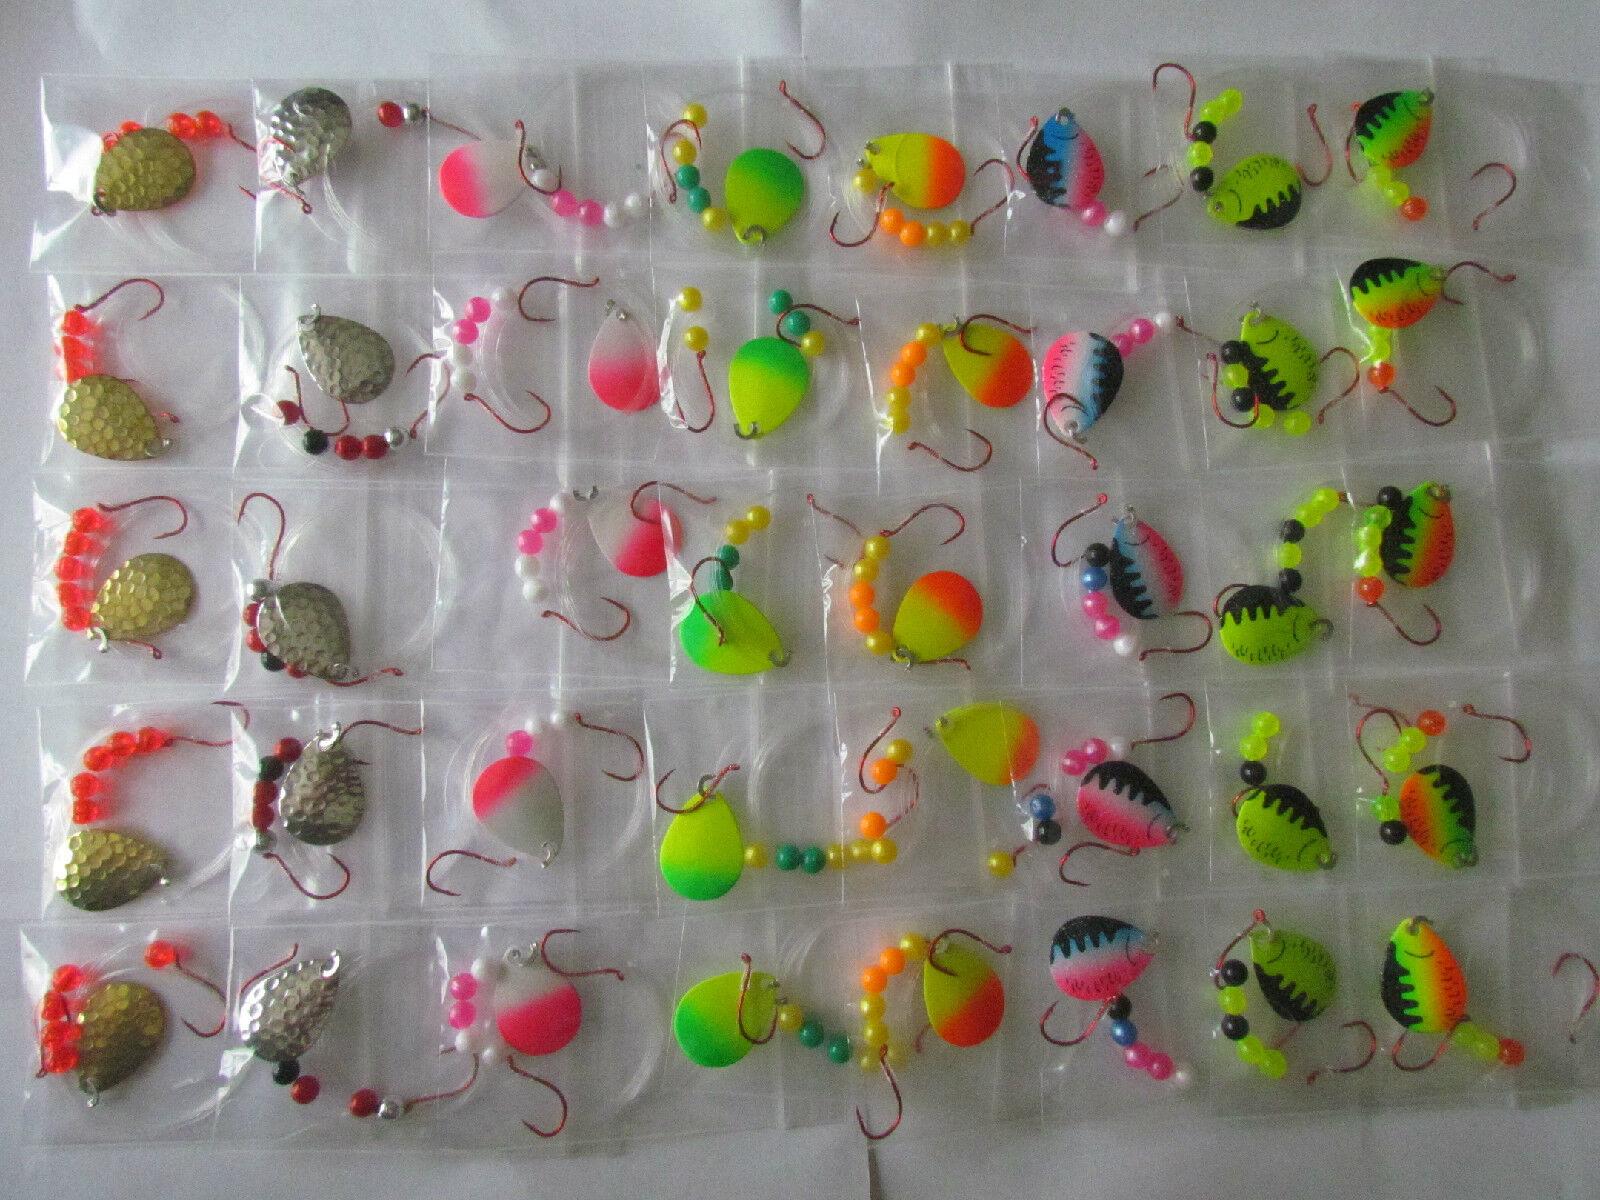 40 Spinner Rigs Leech Minnow Crawler Harness Wtuttieye, Bass, Pike Coloreeado Blades